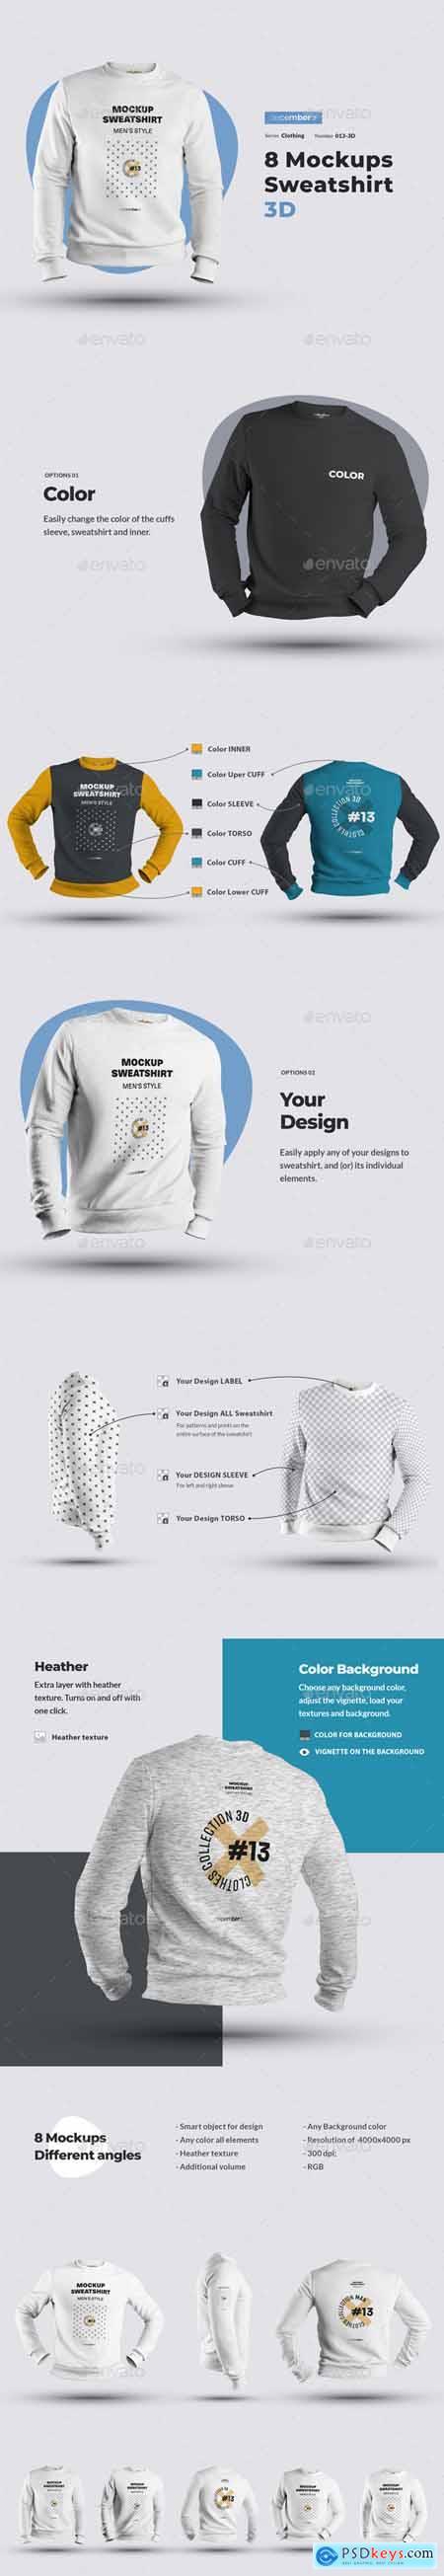 8 Mockups Mens 3D Sweatshirt 25758896